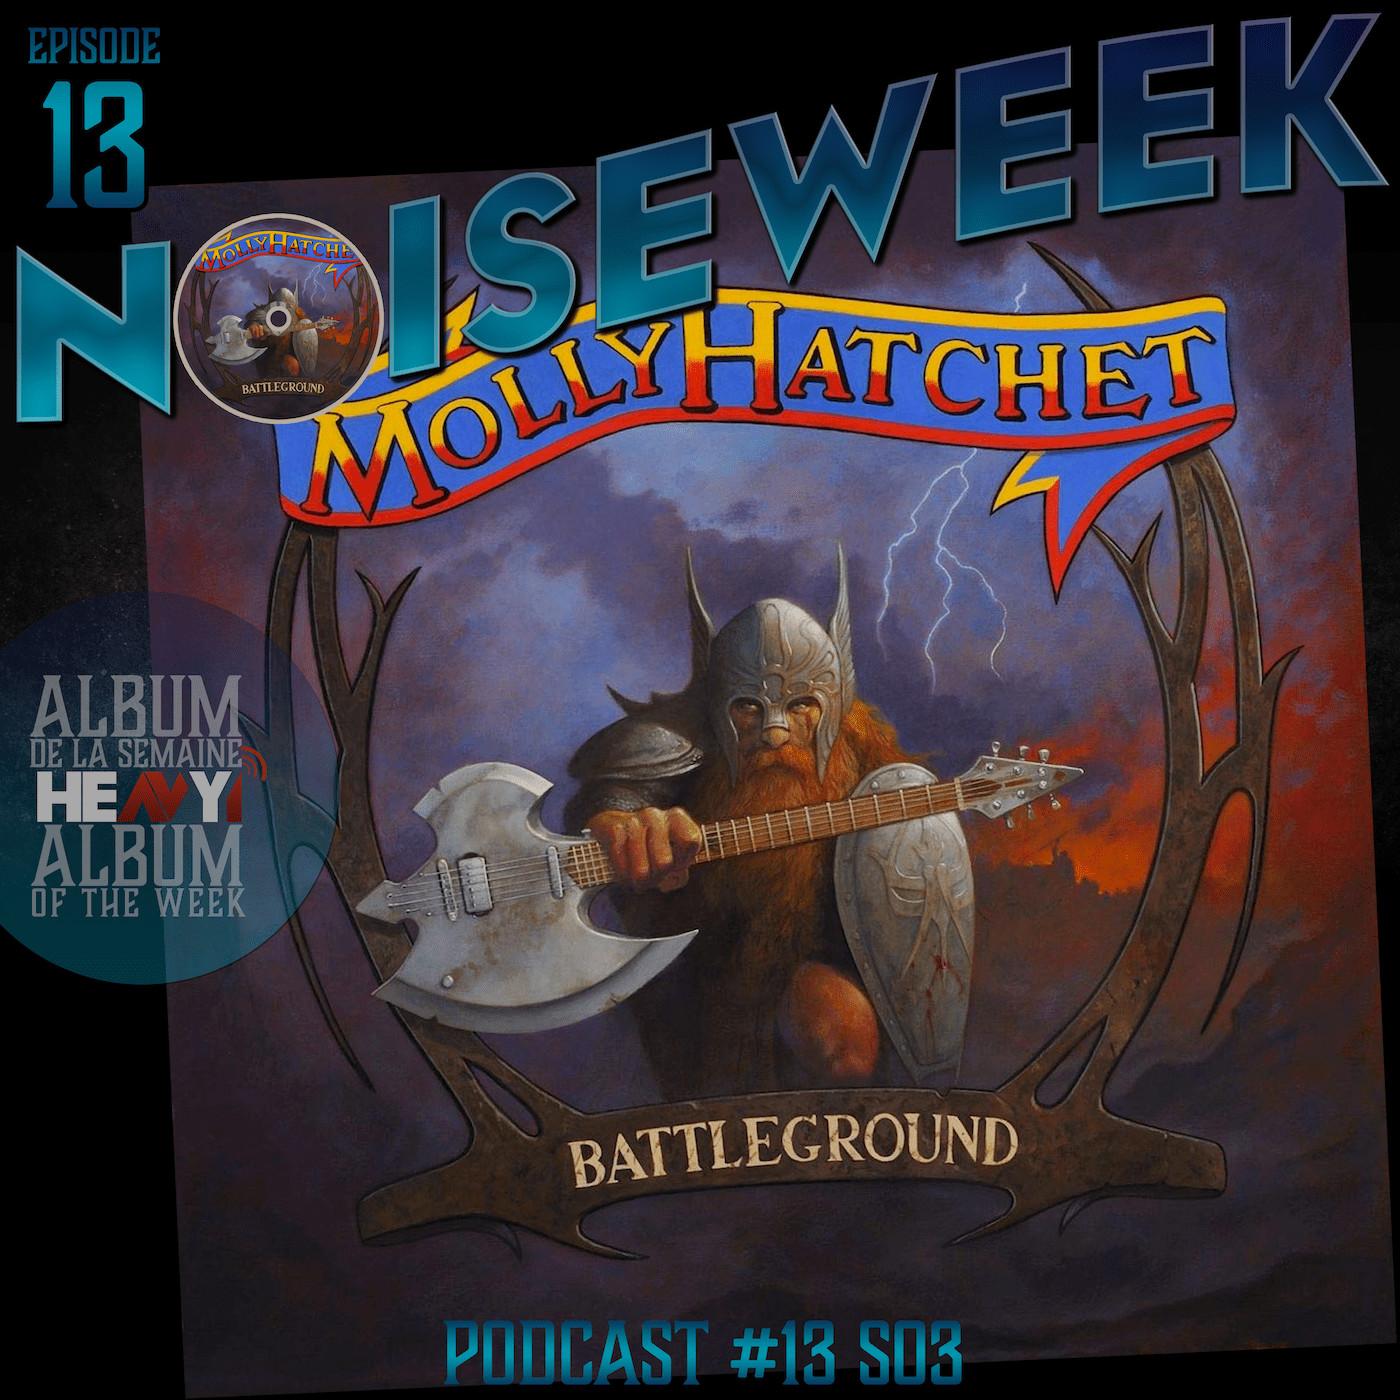 Noiseweek #13 Saison 3